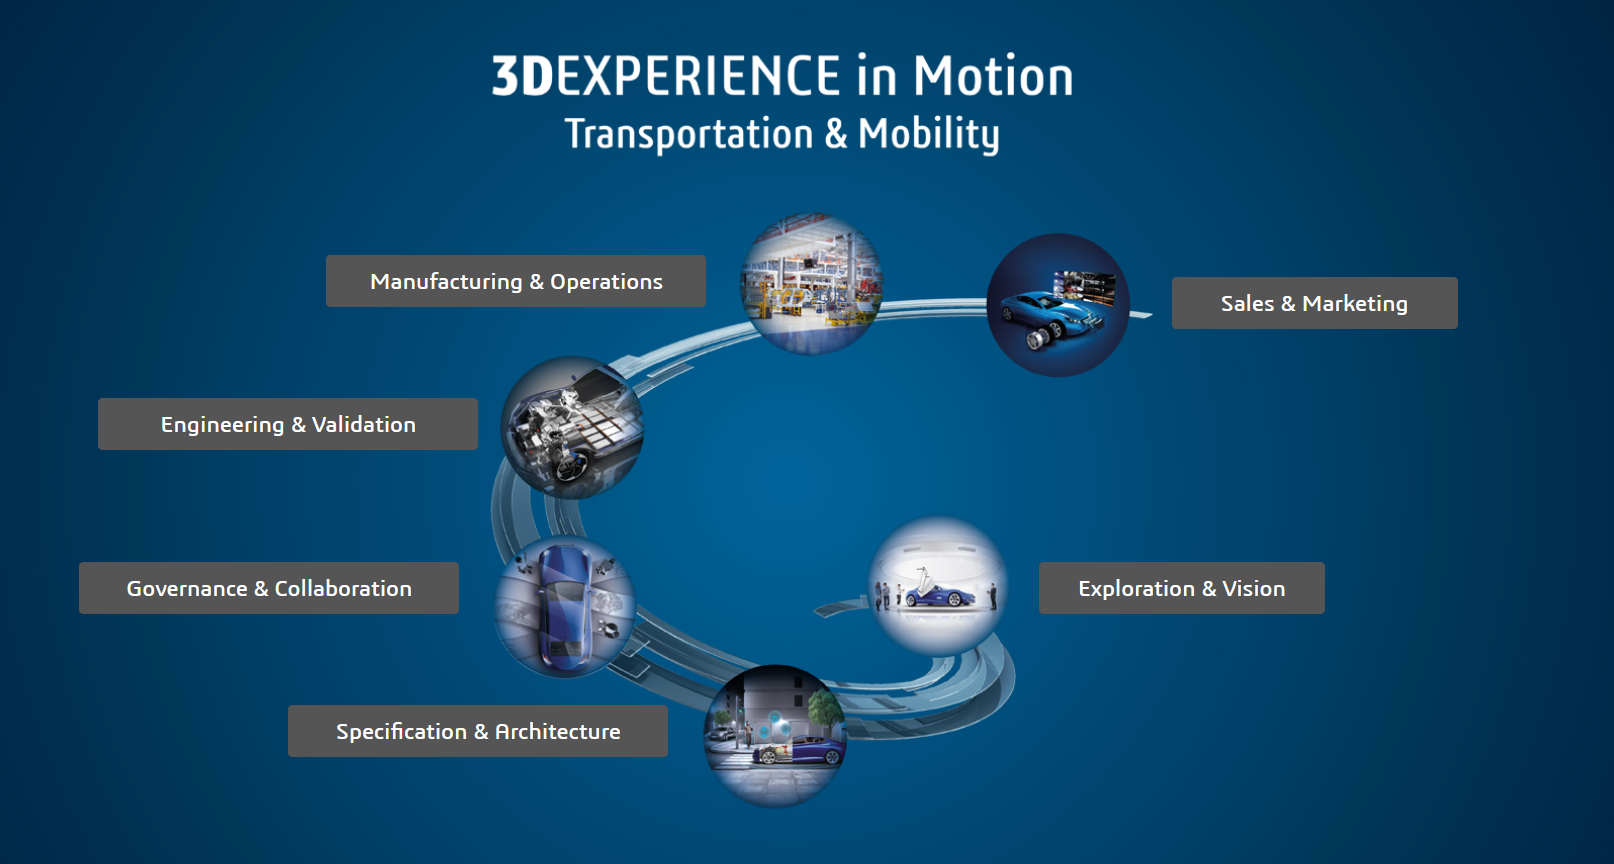 3DEXPERIENCE Playground Transportation & Mobility